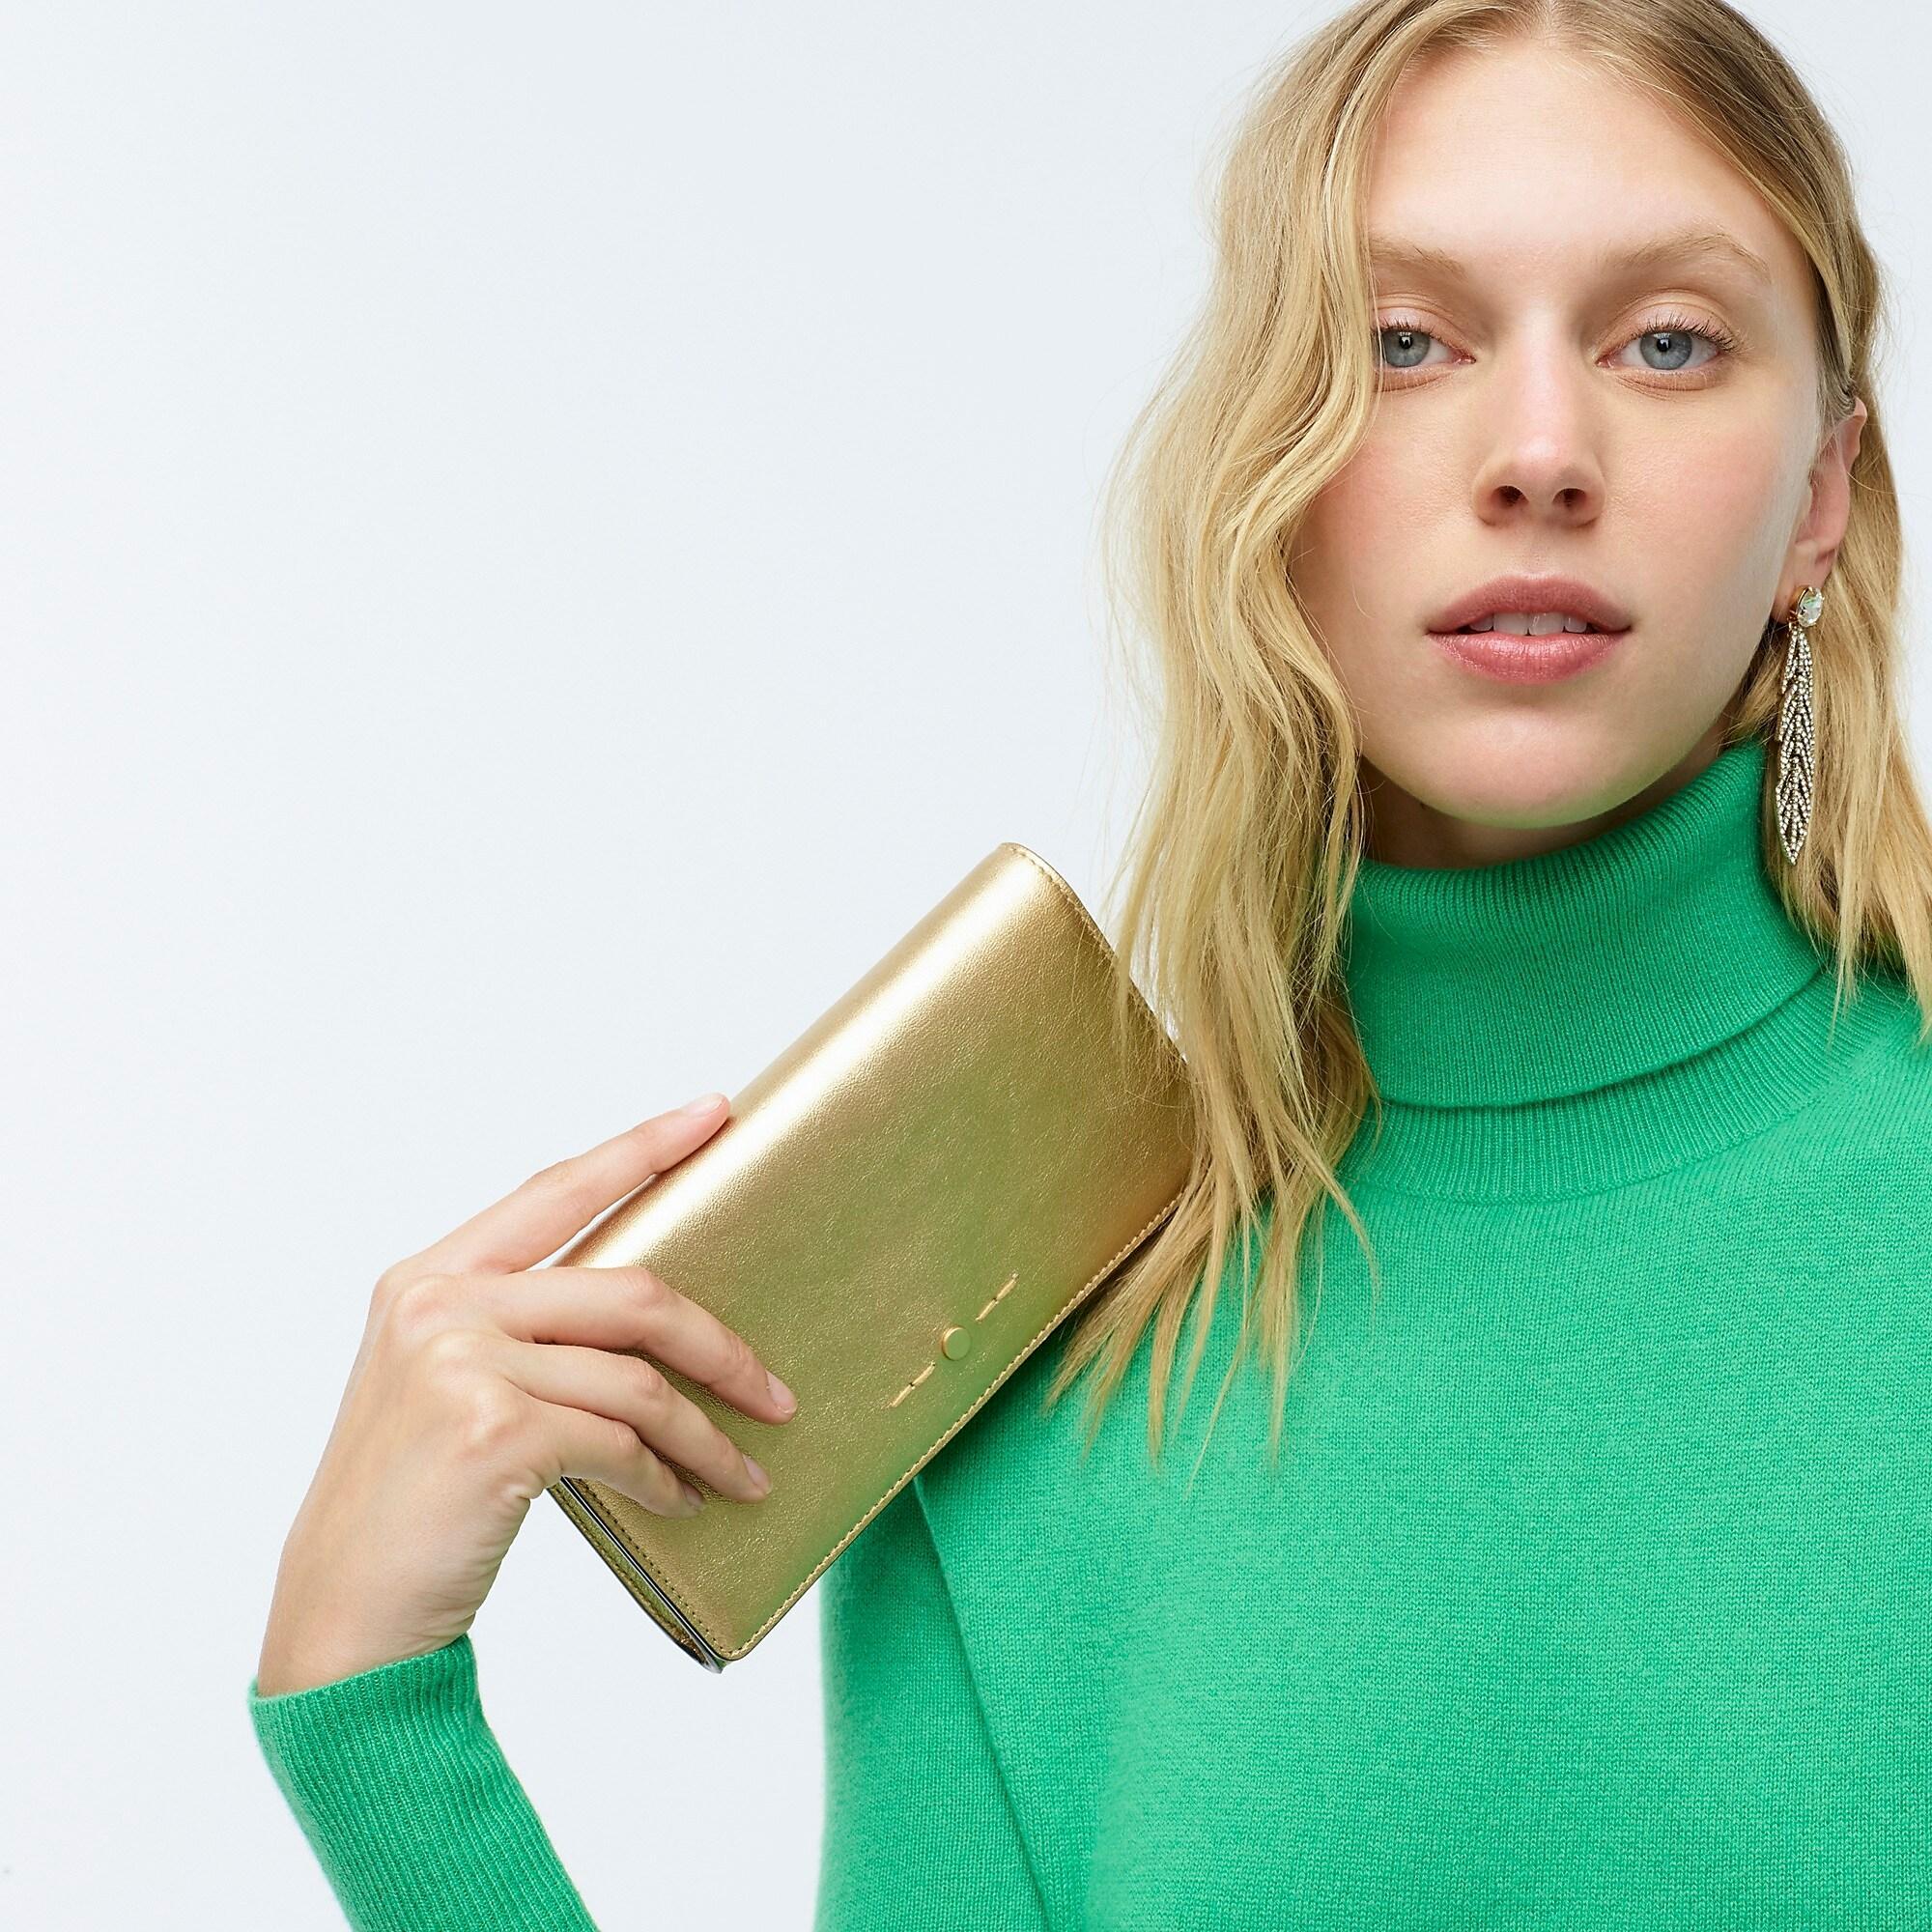 J Crew Convertible Wallet Bag In Metallic Leather Lyst